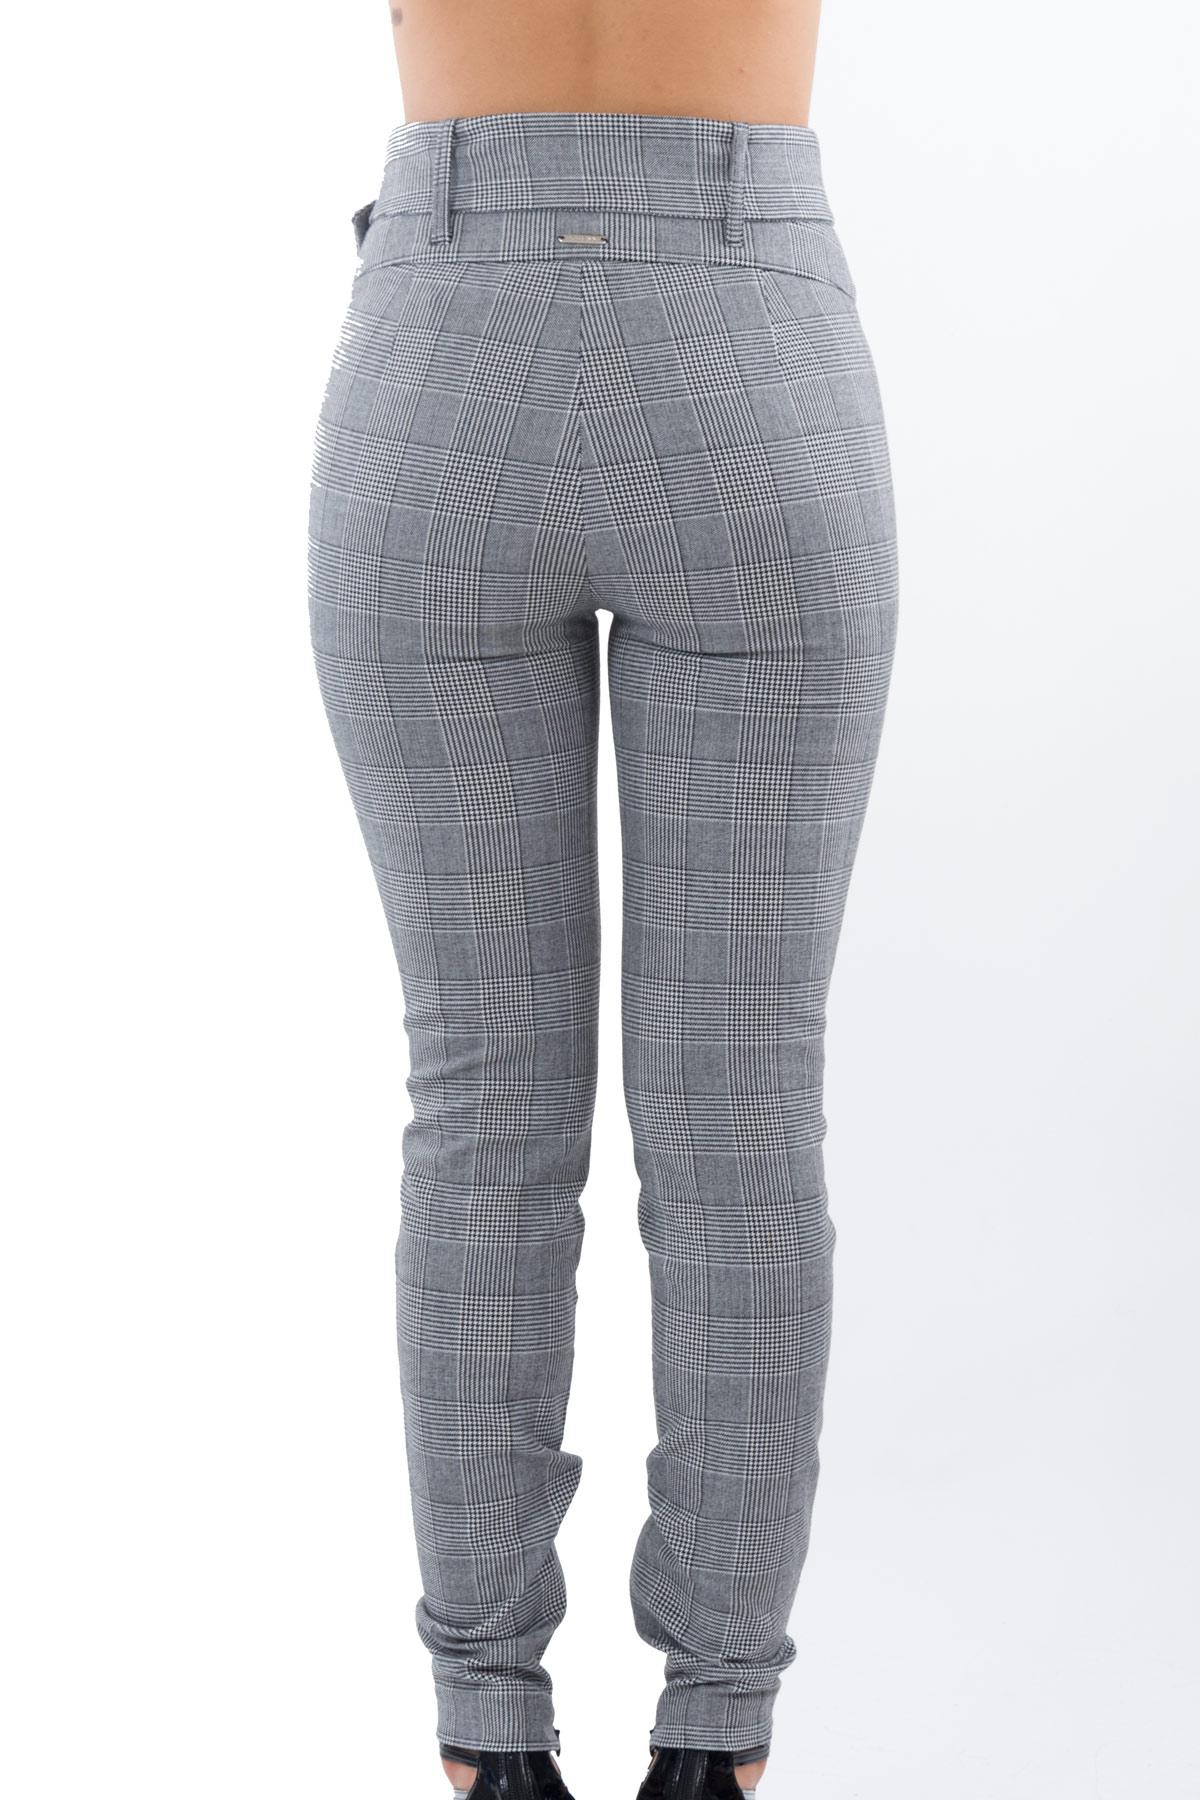 Mariposastore La Cintura Pantalone Galles Guess qwIzBx